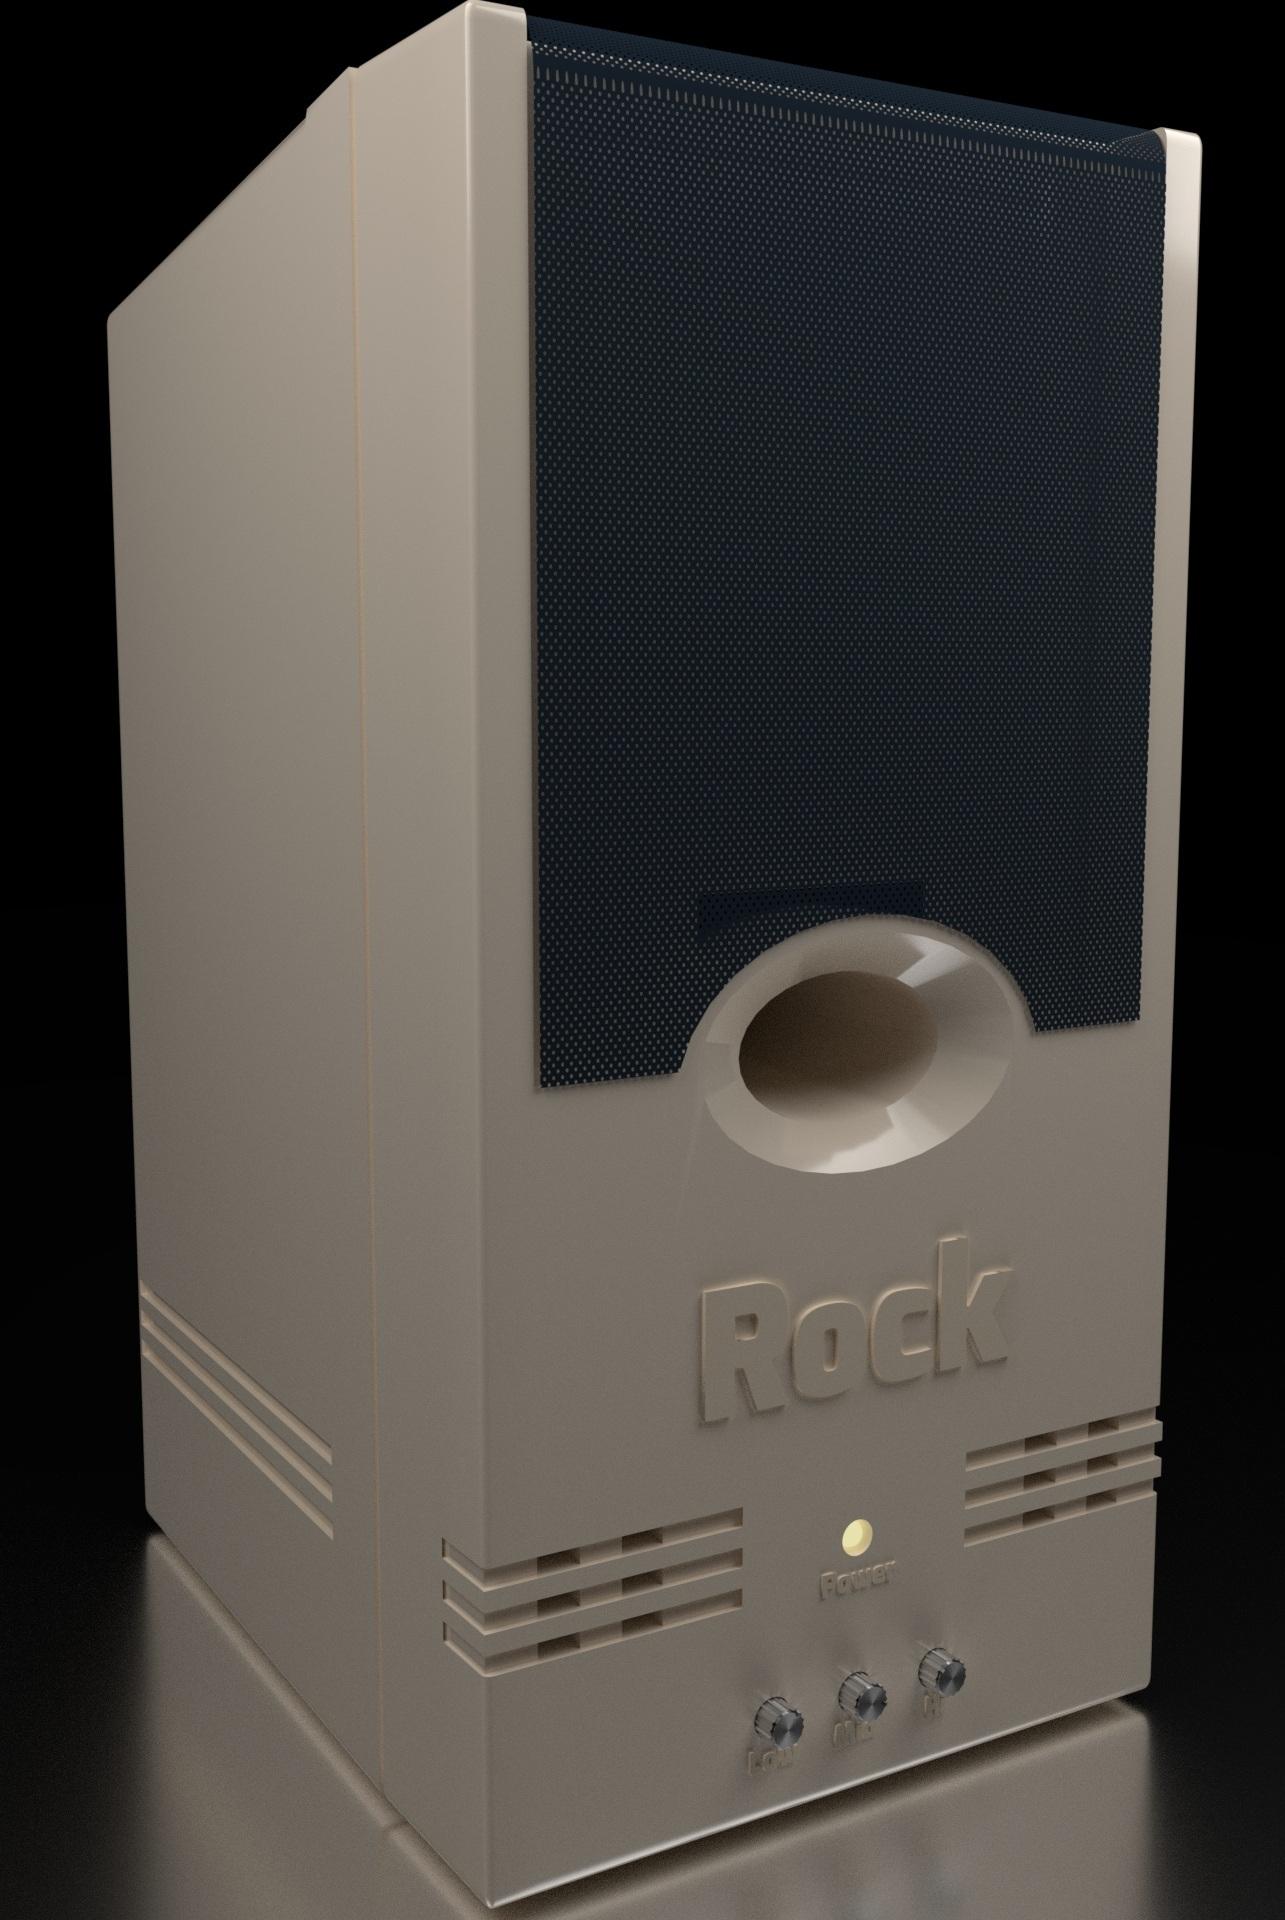 Fotos Gratis M Sica Tecnolog A Mueble Ac Stico Dise O Audio  # Muebles Volumen